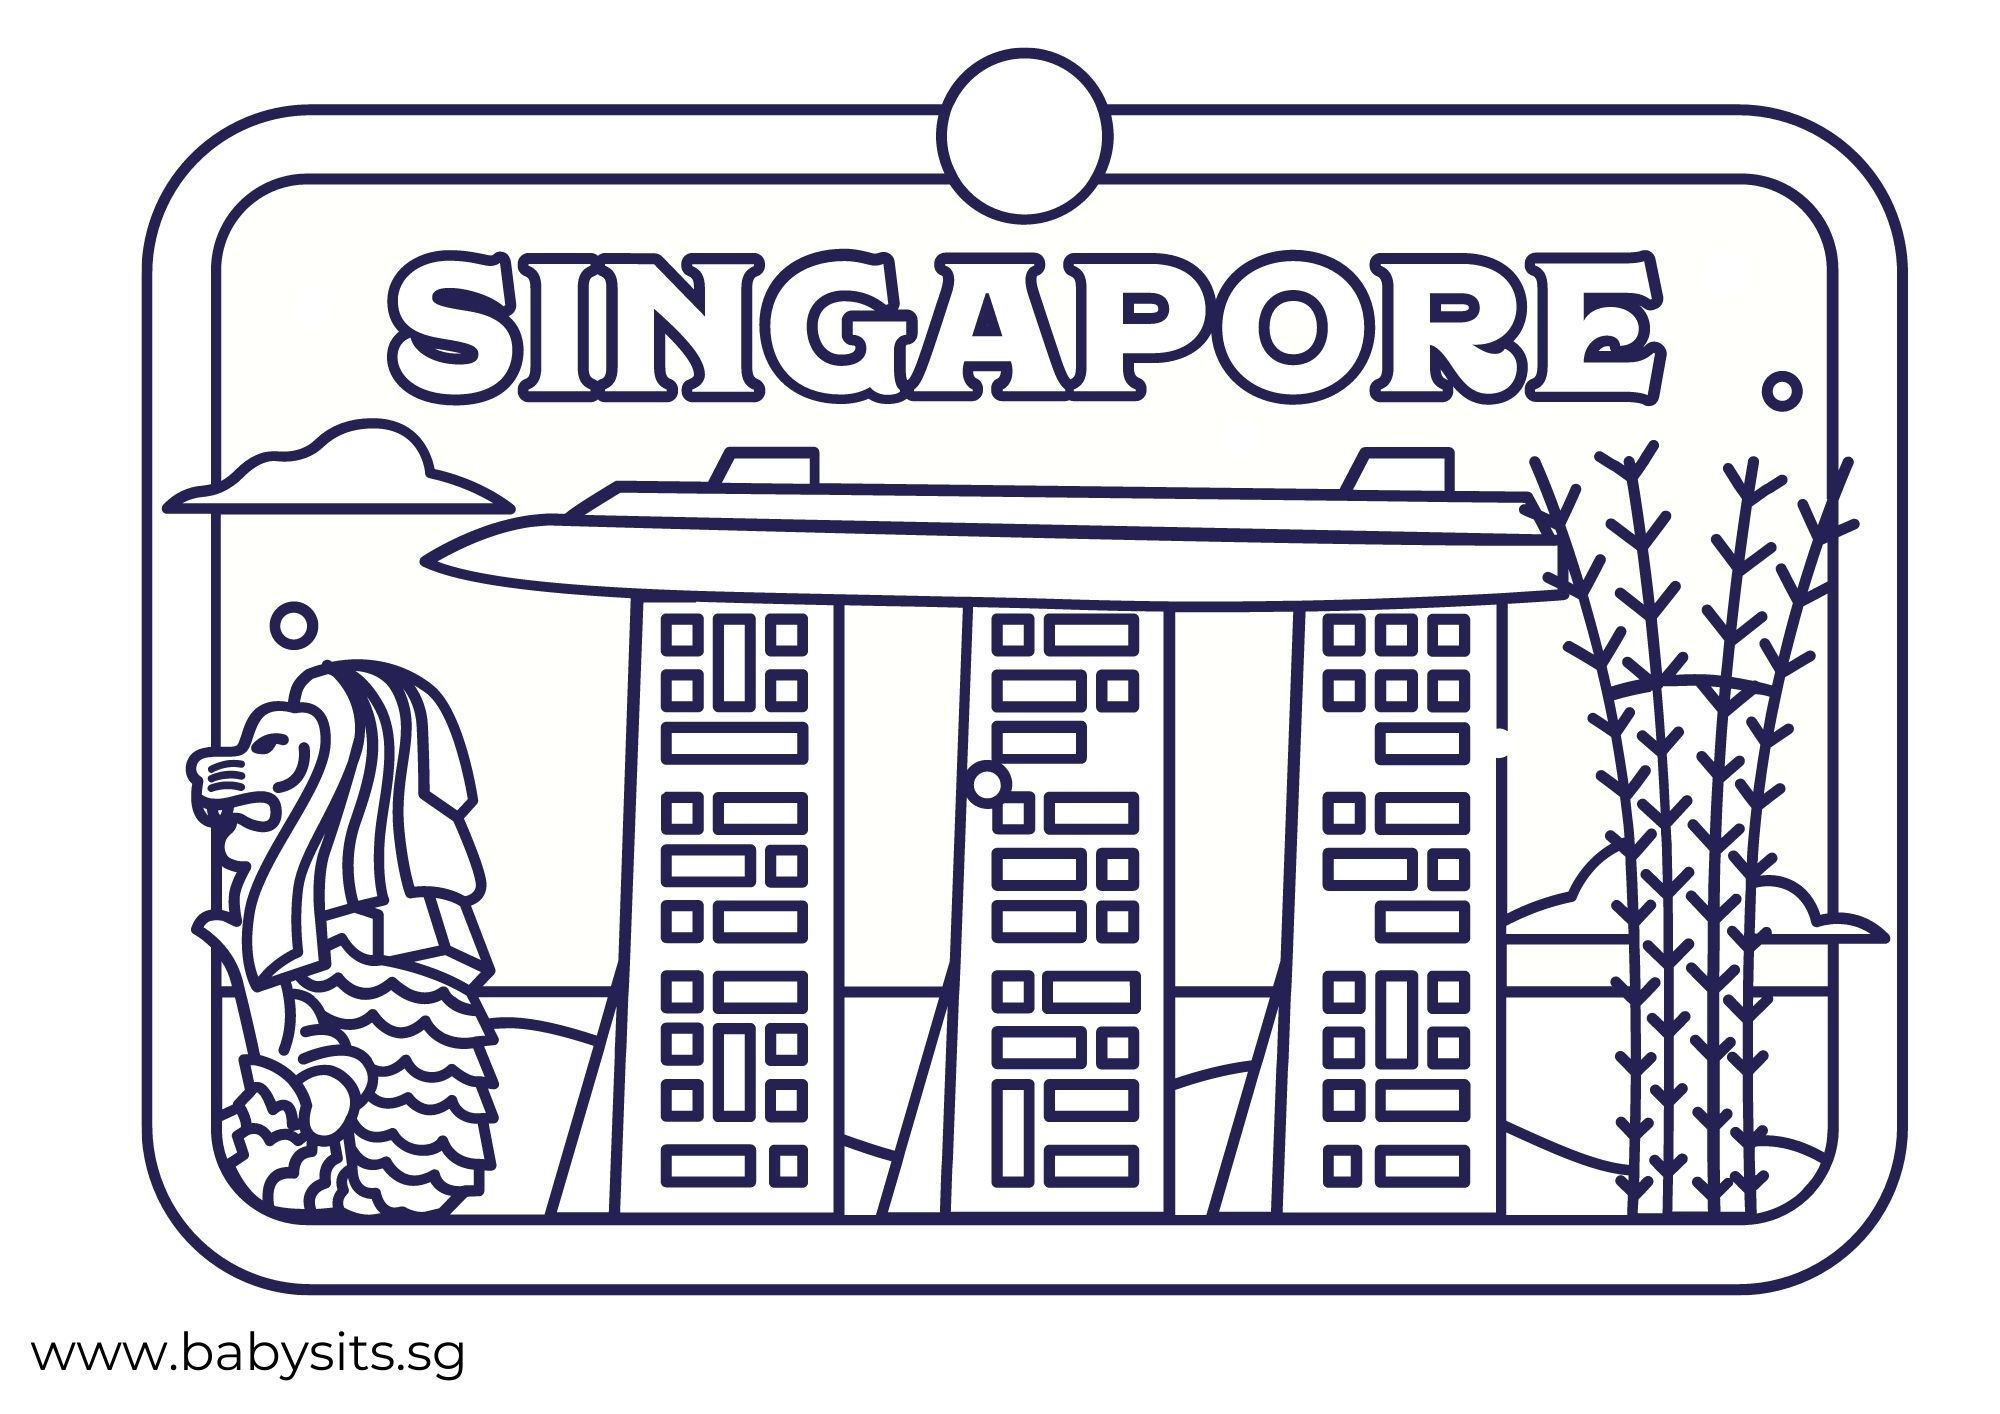 Singapore Skyline colouring page